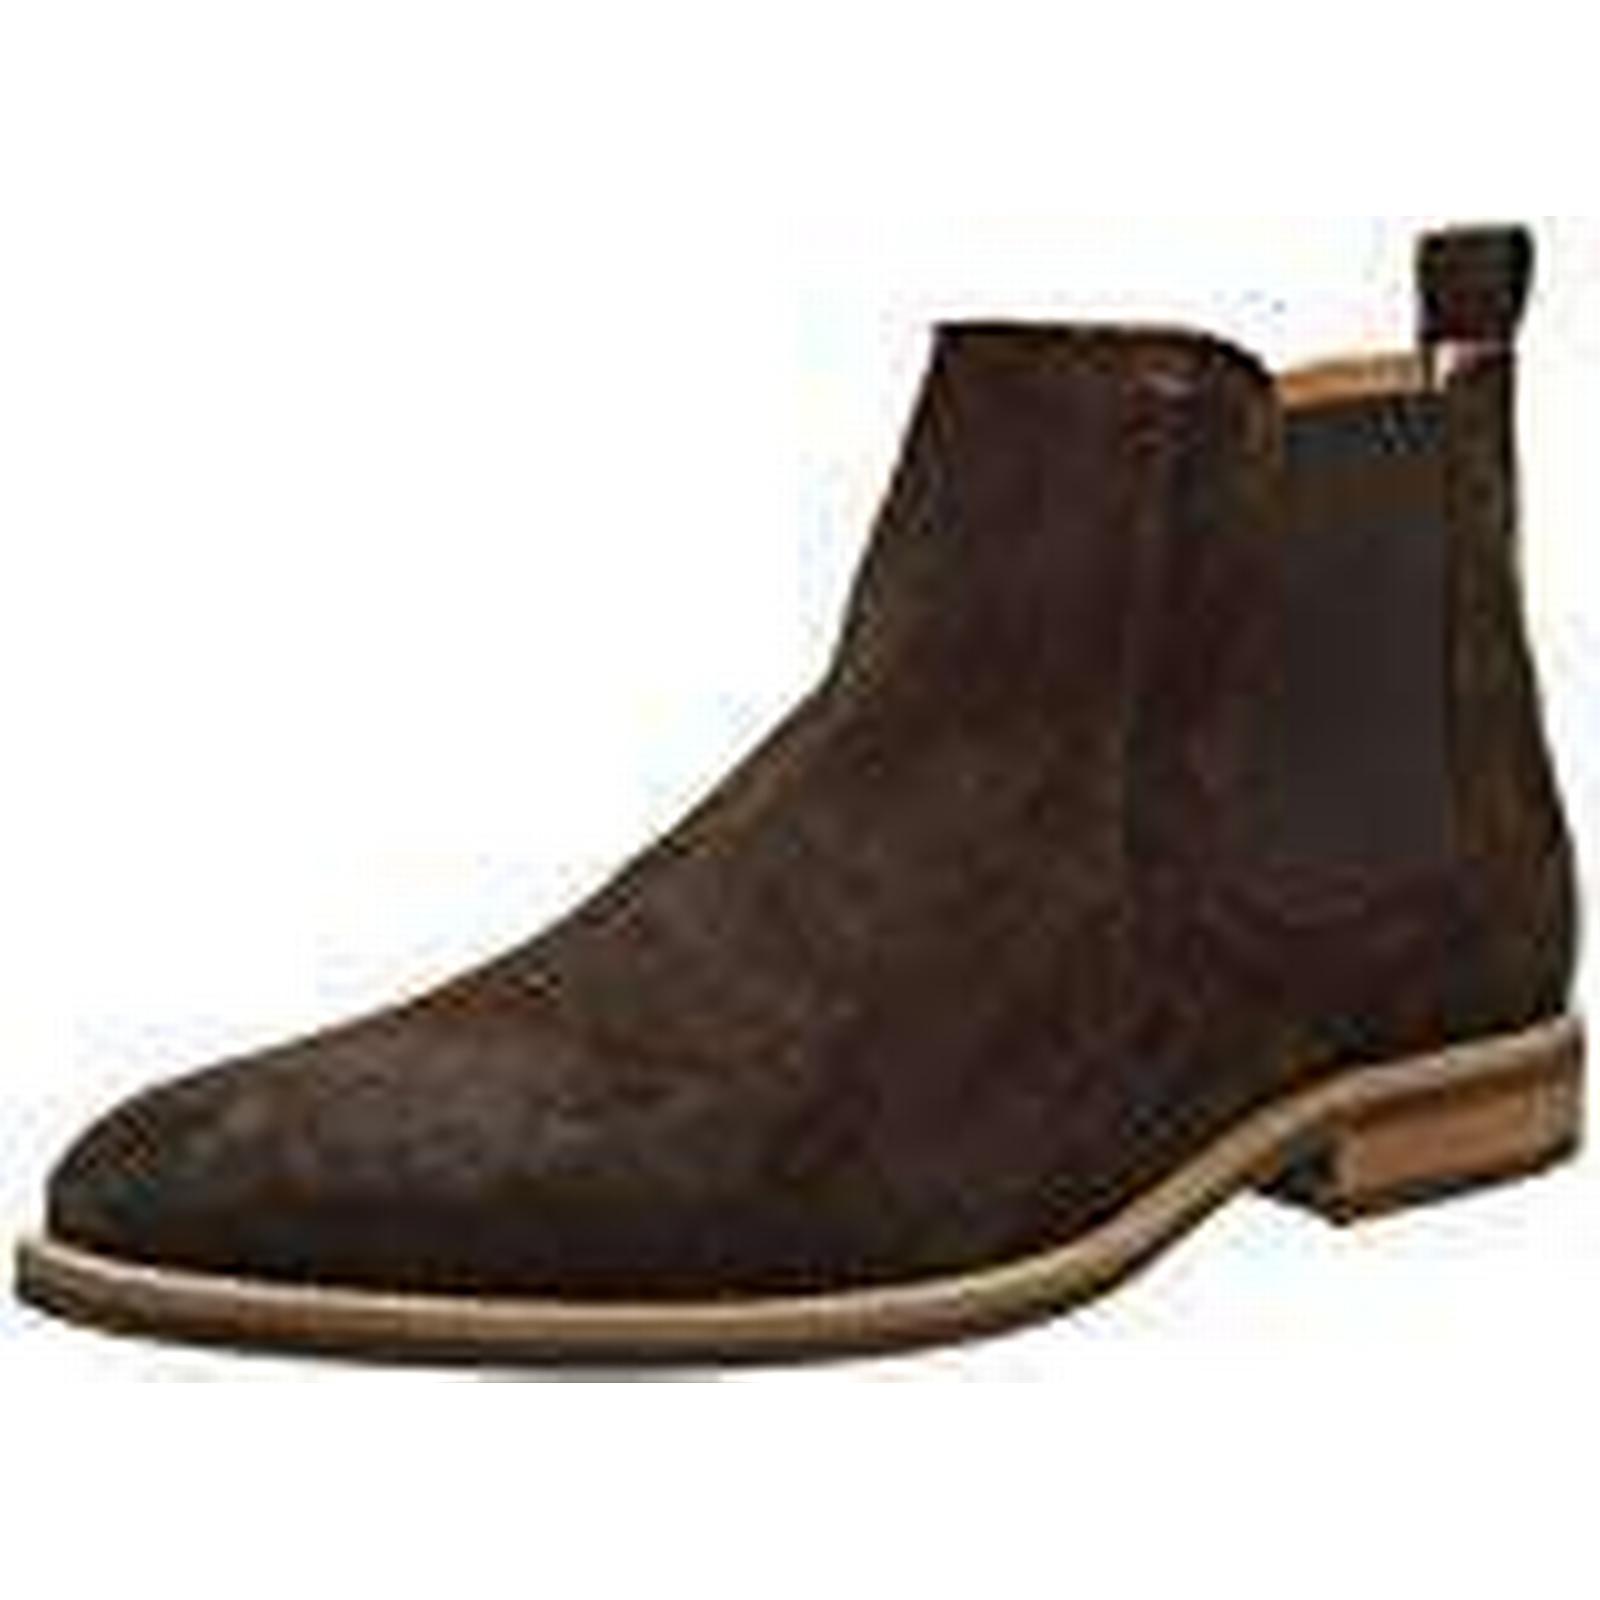 Tommy Bean), Hilfiger D2285Aytona 4B, Men's Chelsea Boots, Brown (Coffee Bean), Tommy 10½ UK (45 EU) c390b4